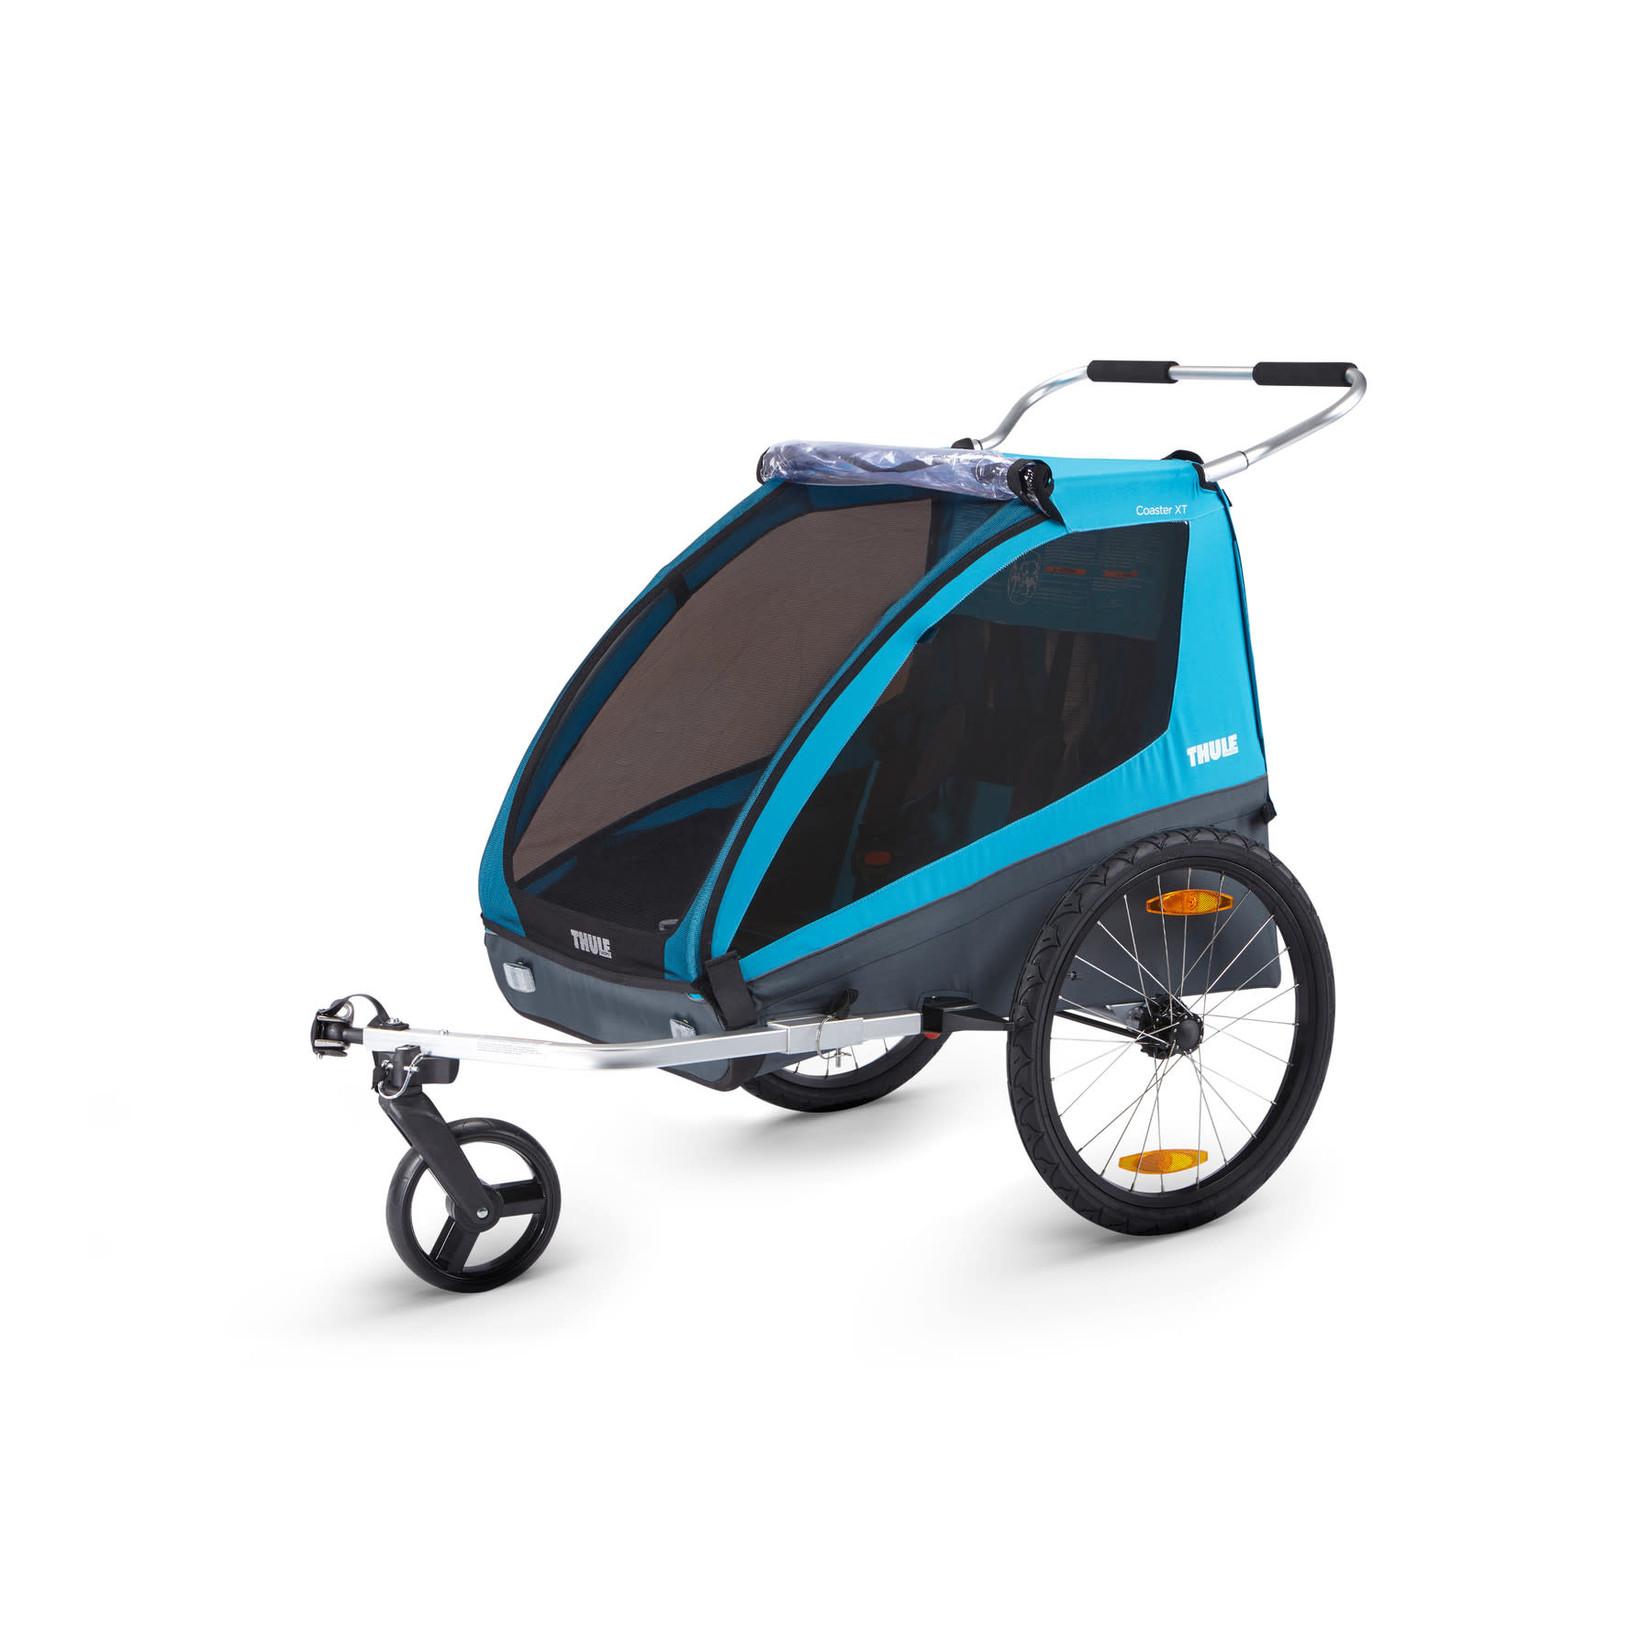 Thule Thule Child Carrier, Coaster XT, Blu